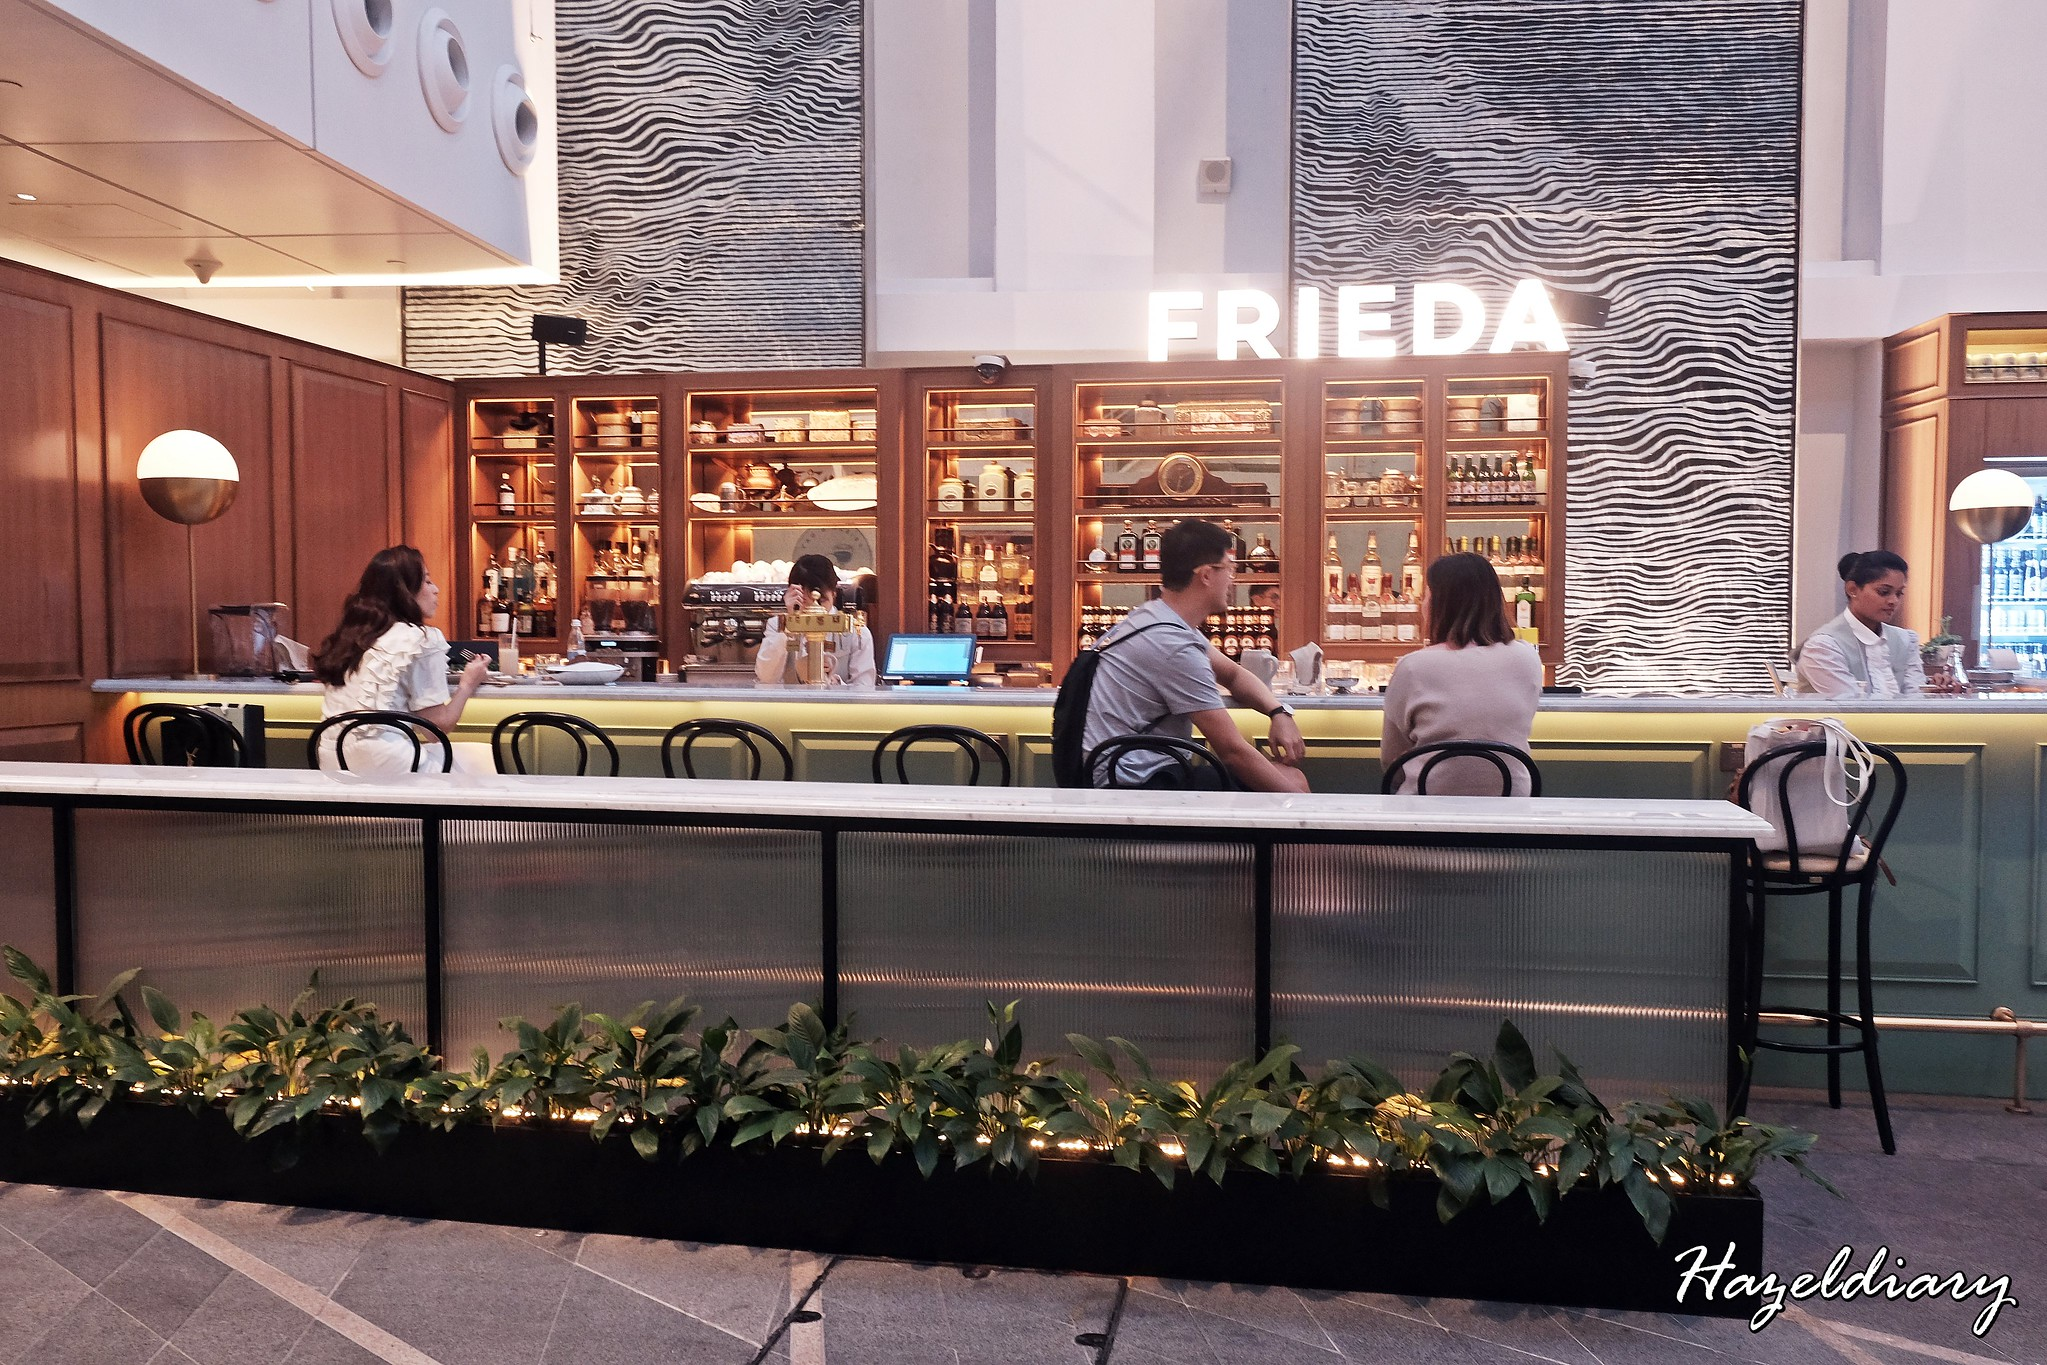 Frieda Restaurant and Bar